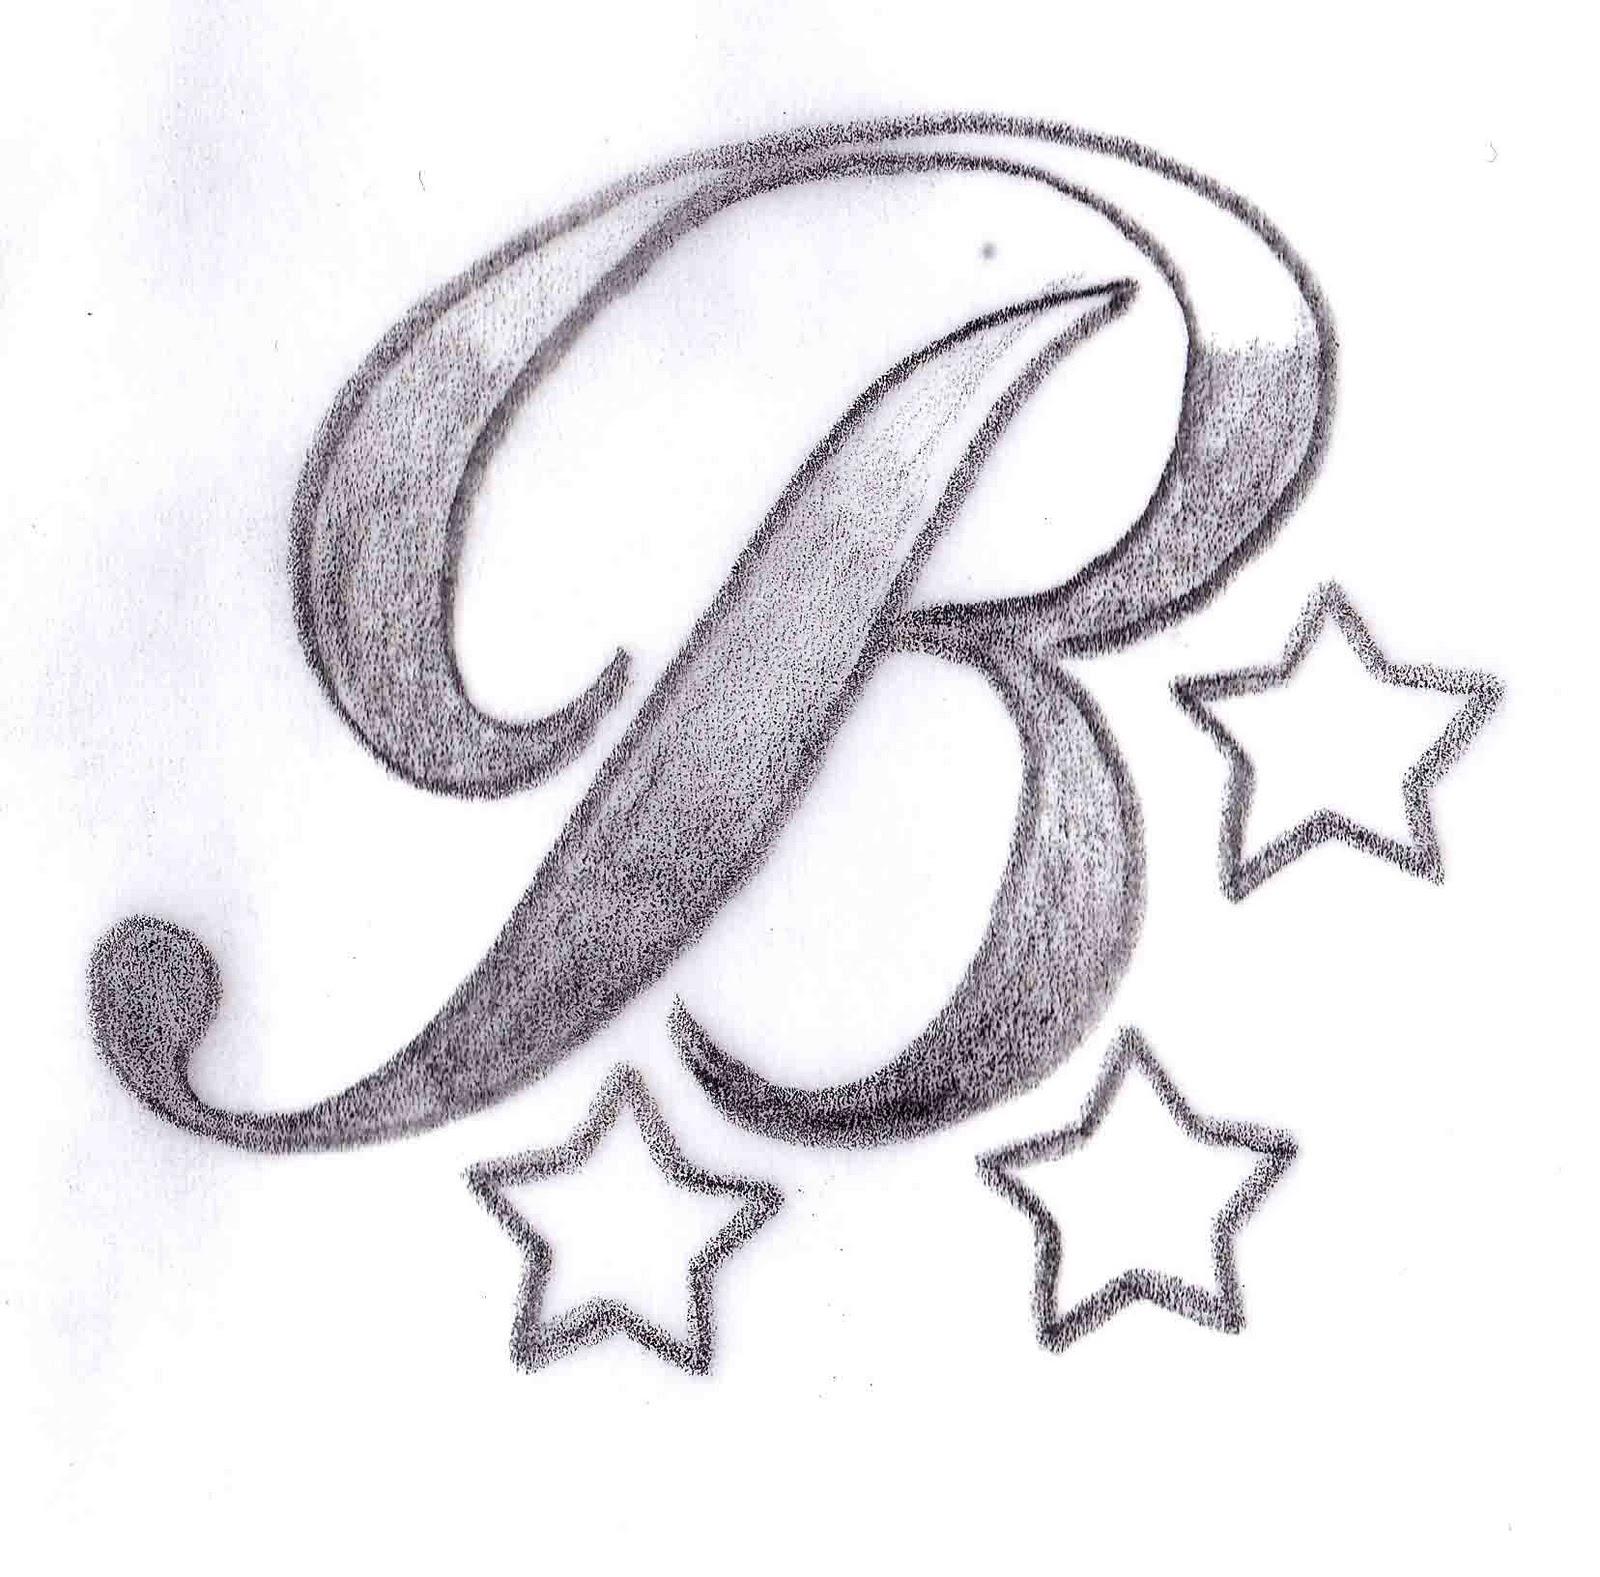 Фото буквы для тату русские буквы